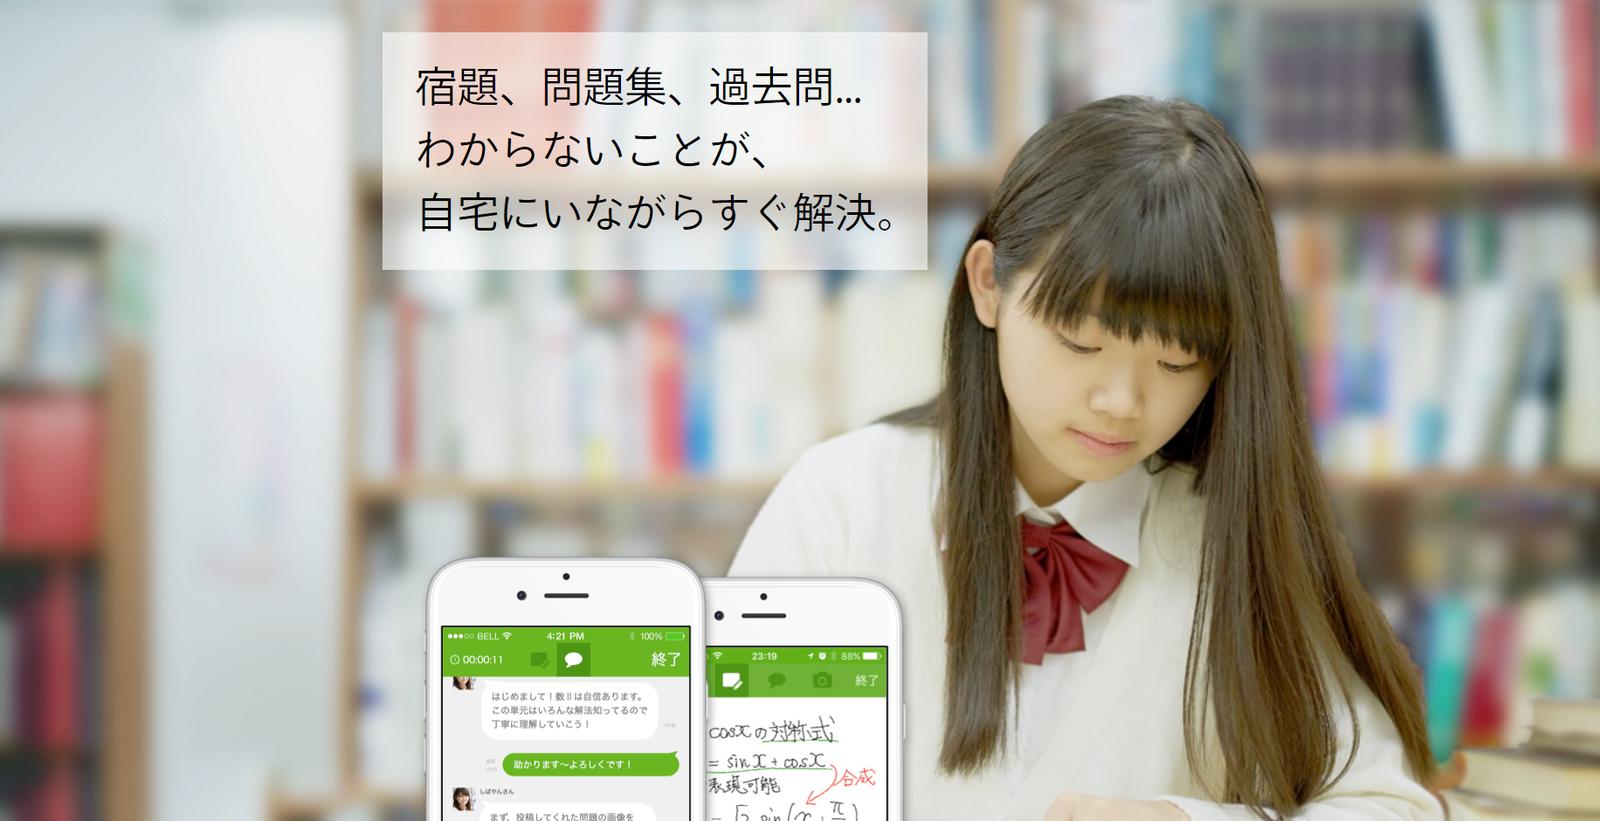 【Kotlin】Edtechの代名詞「スマホ家庭教師manabo」Androidエンジニア募集!